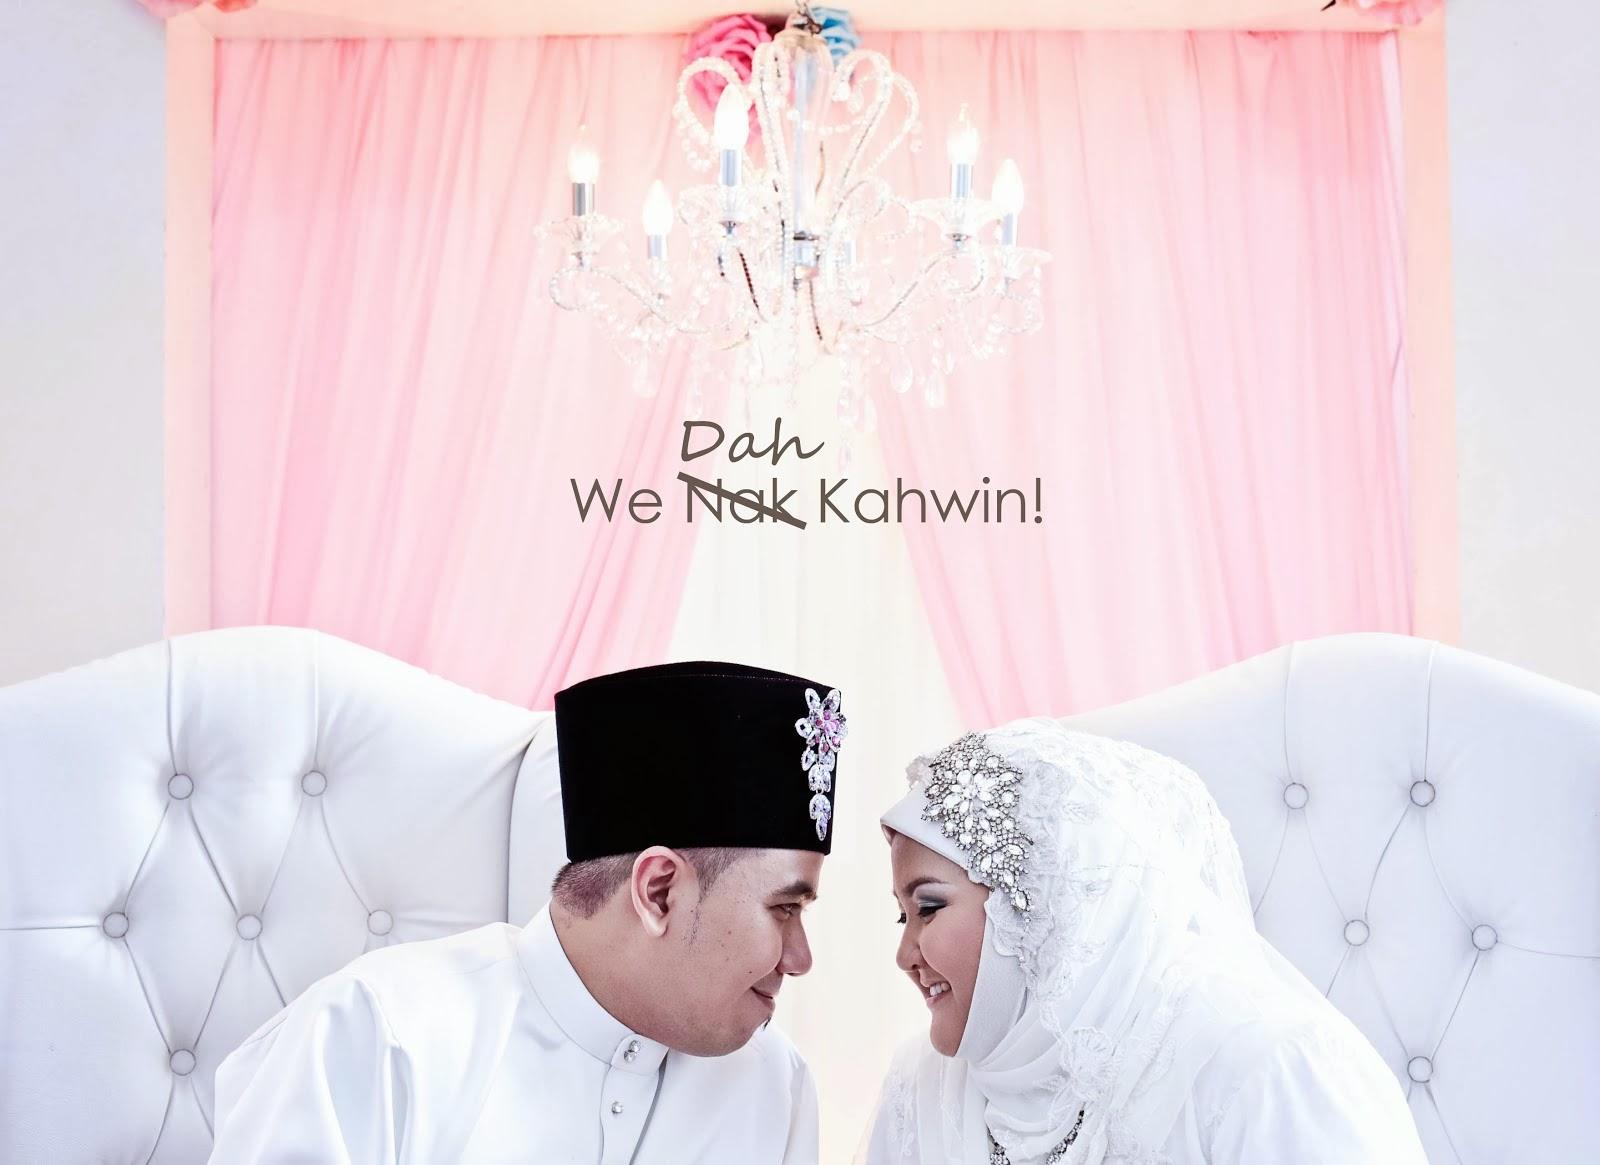 We Nak Kahwin!